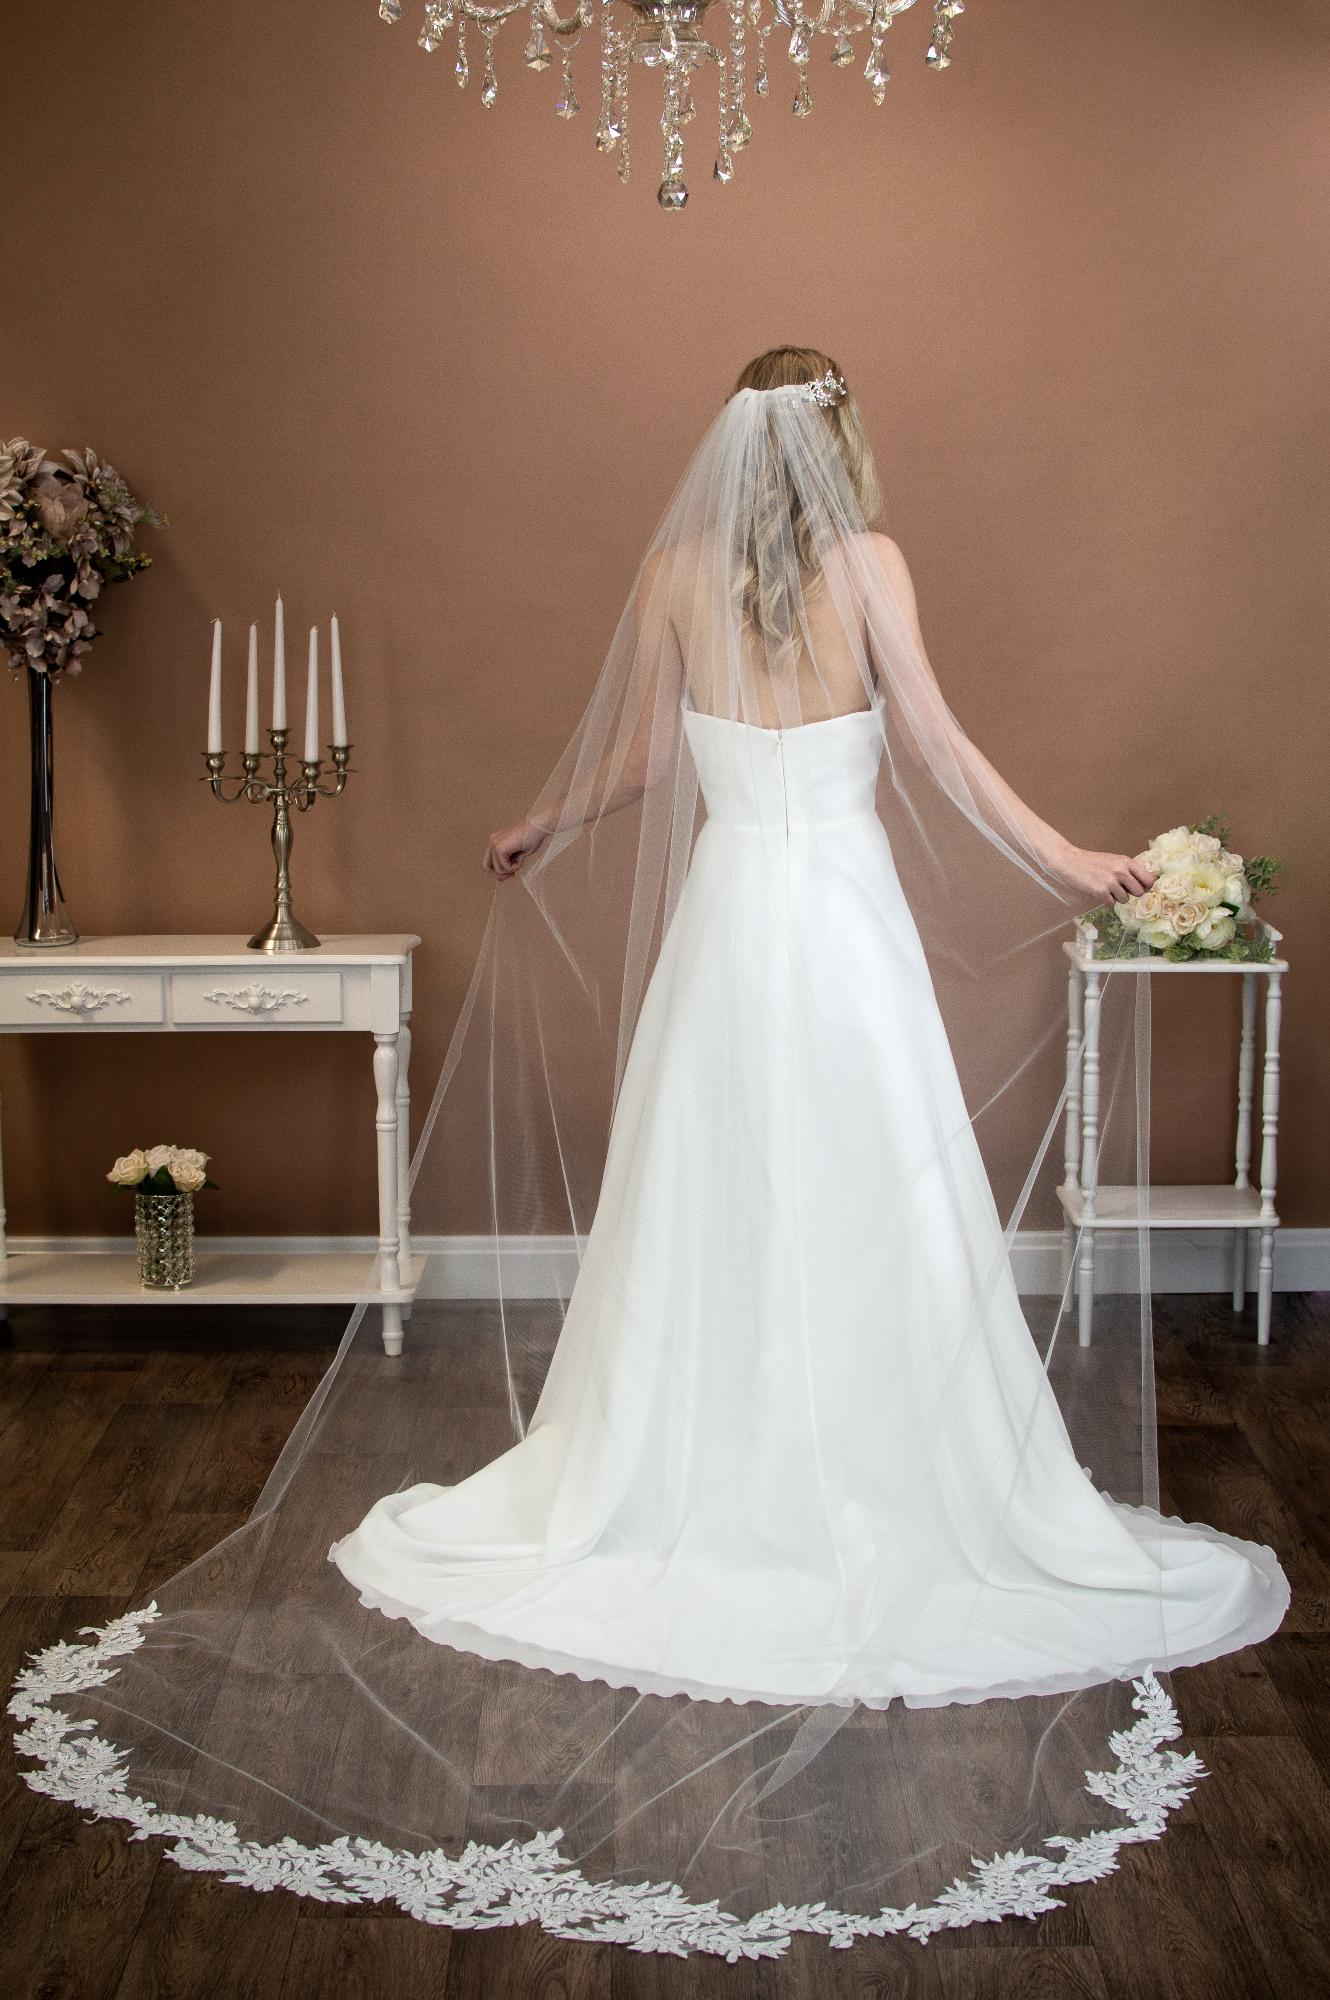 The Wedding Veil Shop Wedding Veil Lengths Styles For Every Bride Love My Dress Uk Wedding Blog Wedding Directory